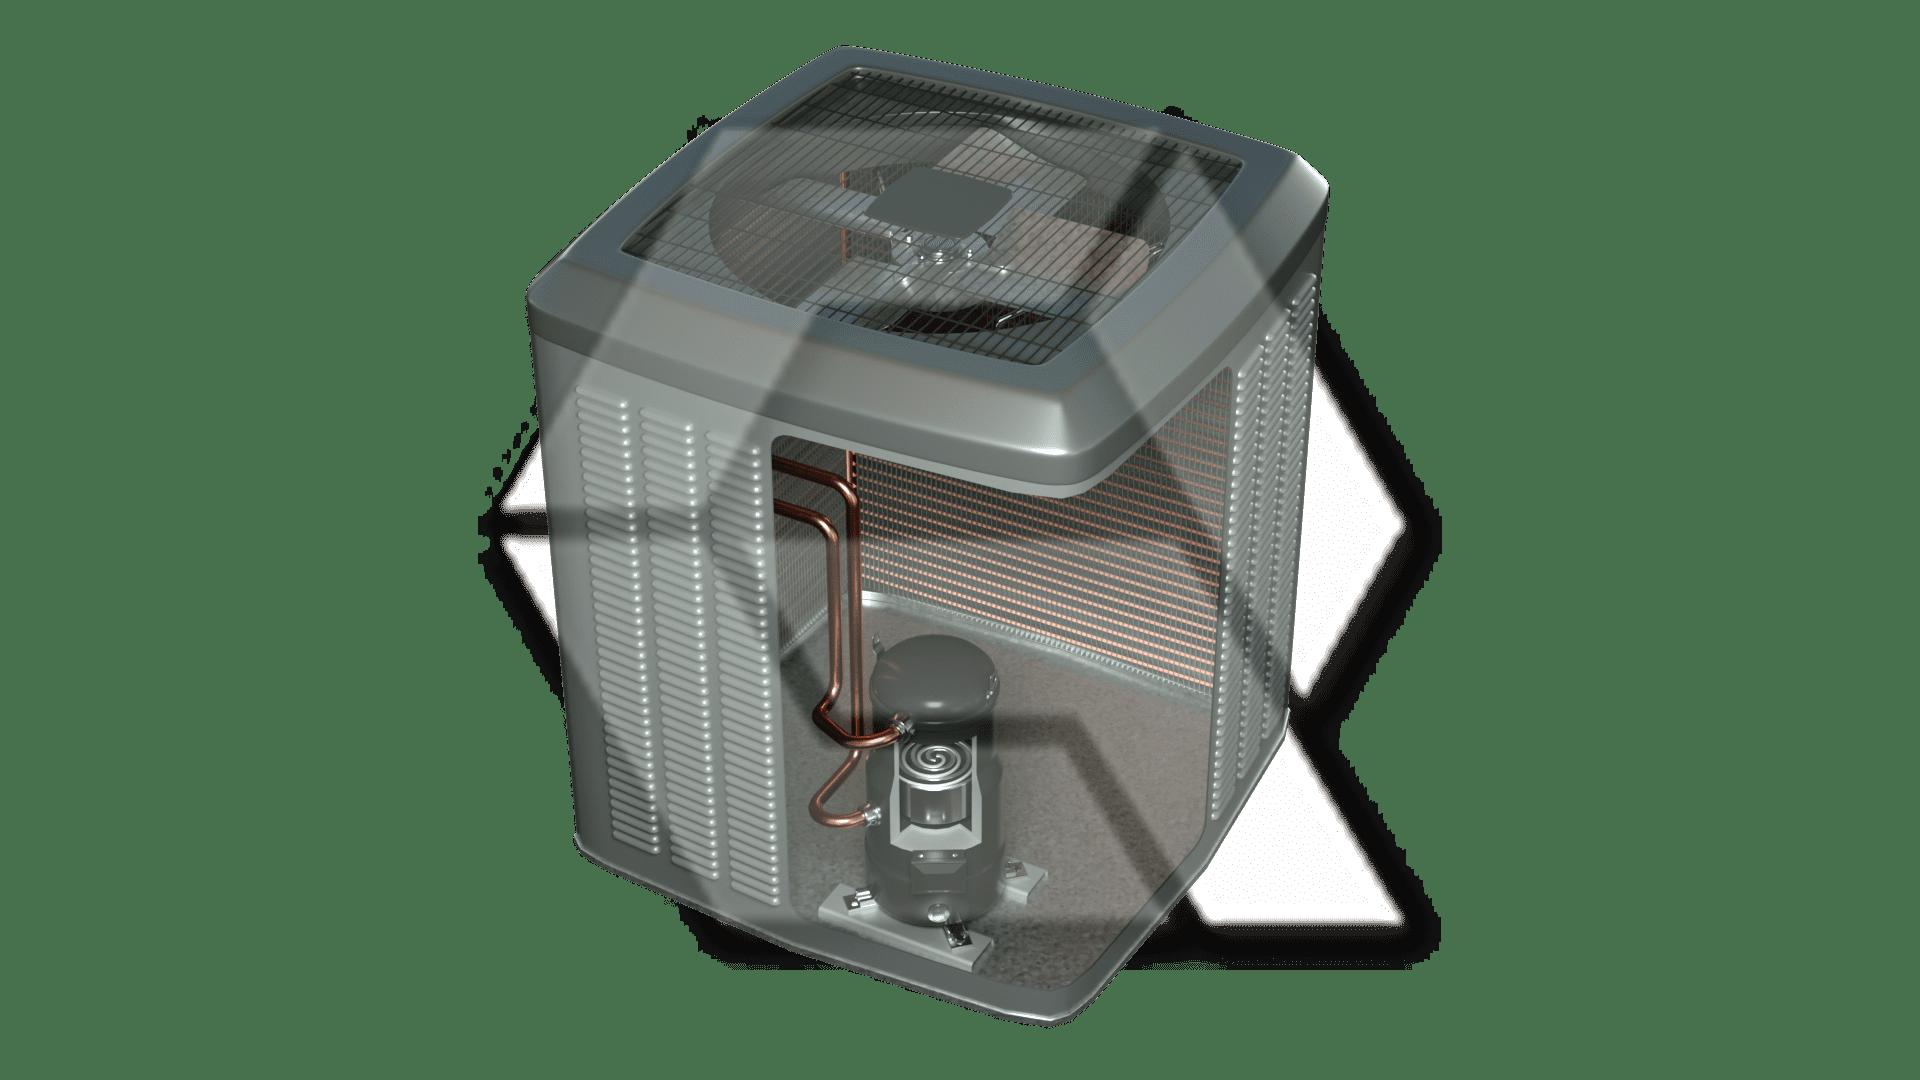 Amana-ACXX16 Split System - Outdoor